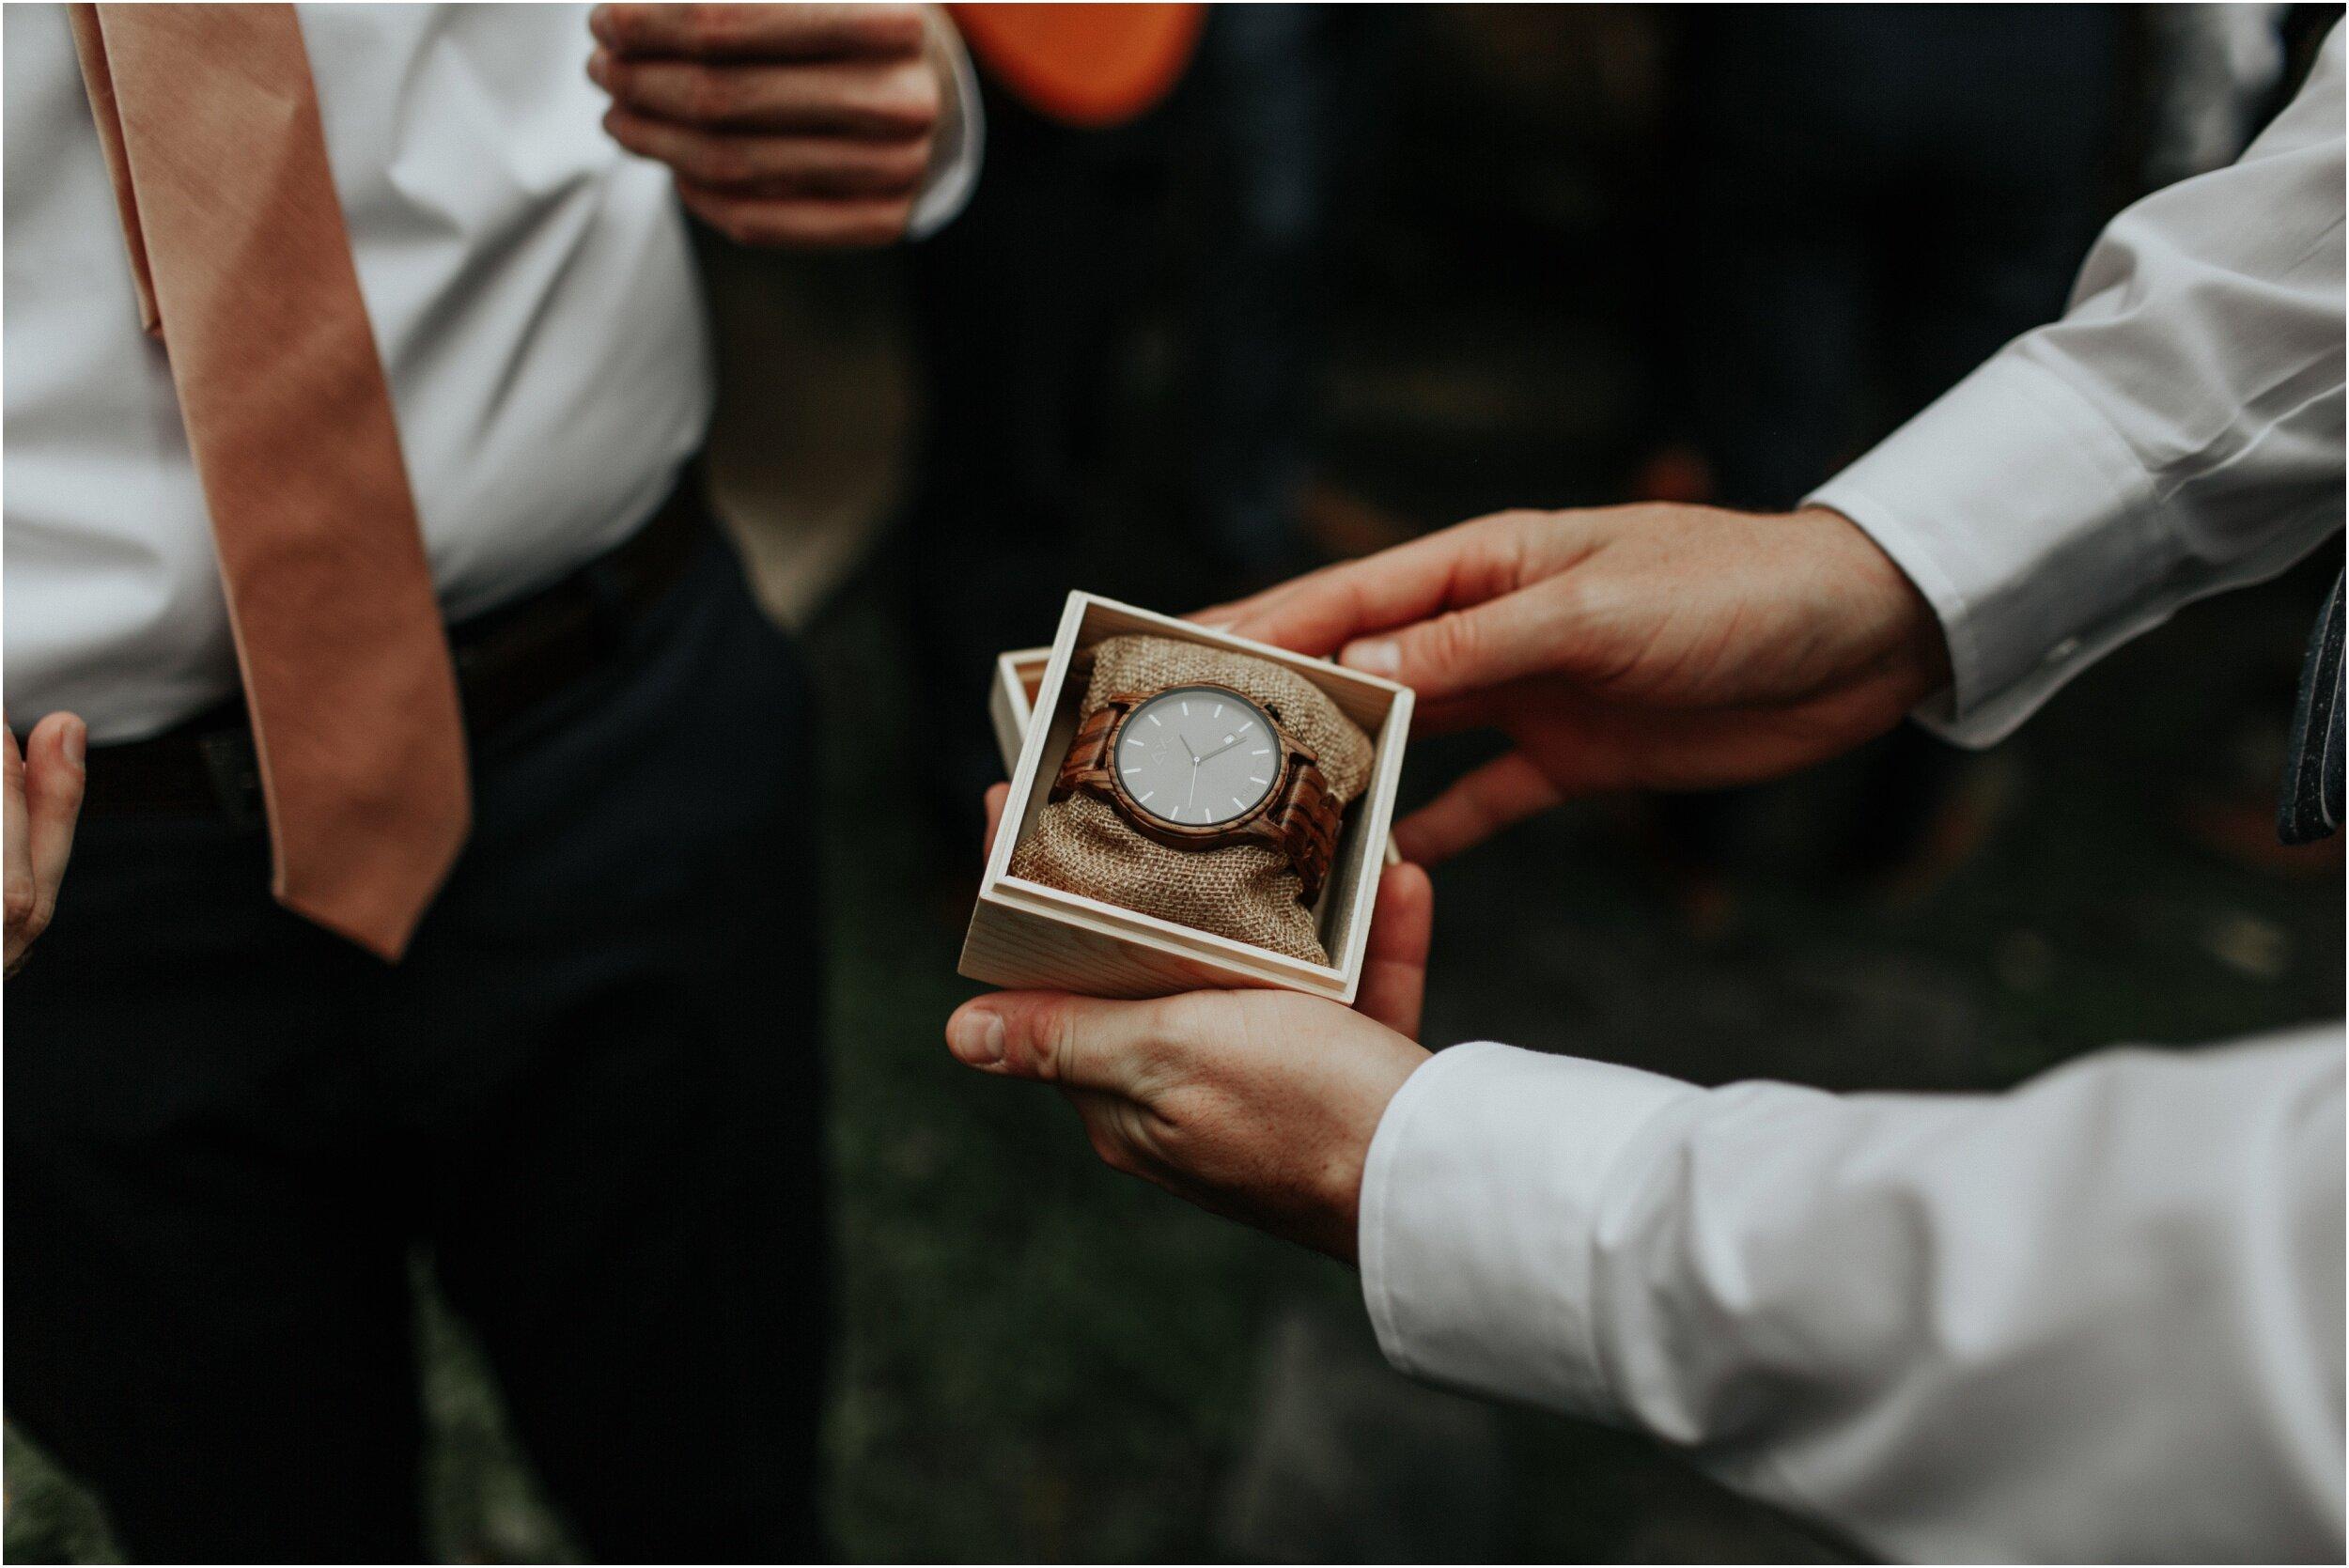 steph-and-jordan-cox-our-wedding-historic-shady-lane-compass-wedding-collective-hazel-lining-photography-destination-elopement-wedding-engagement-photography_0025.jpg